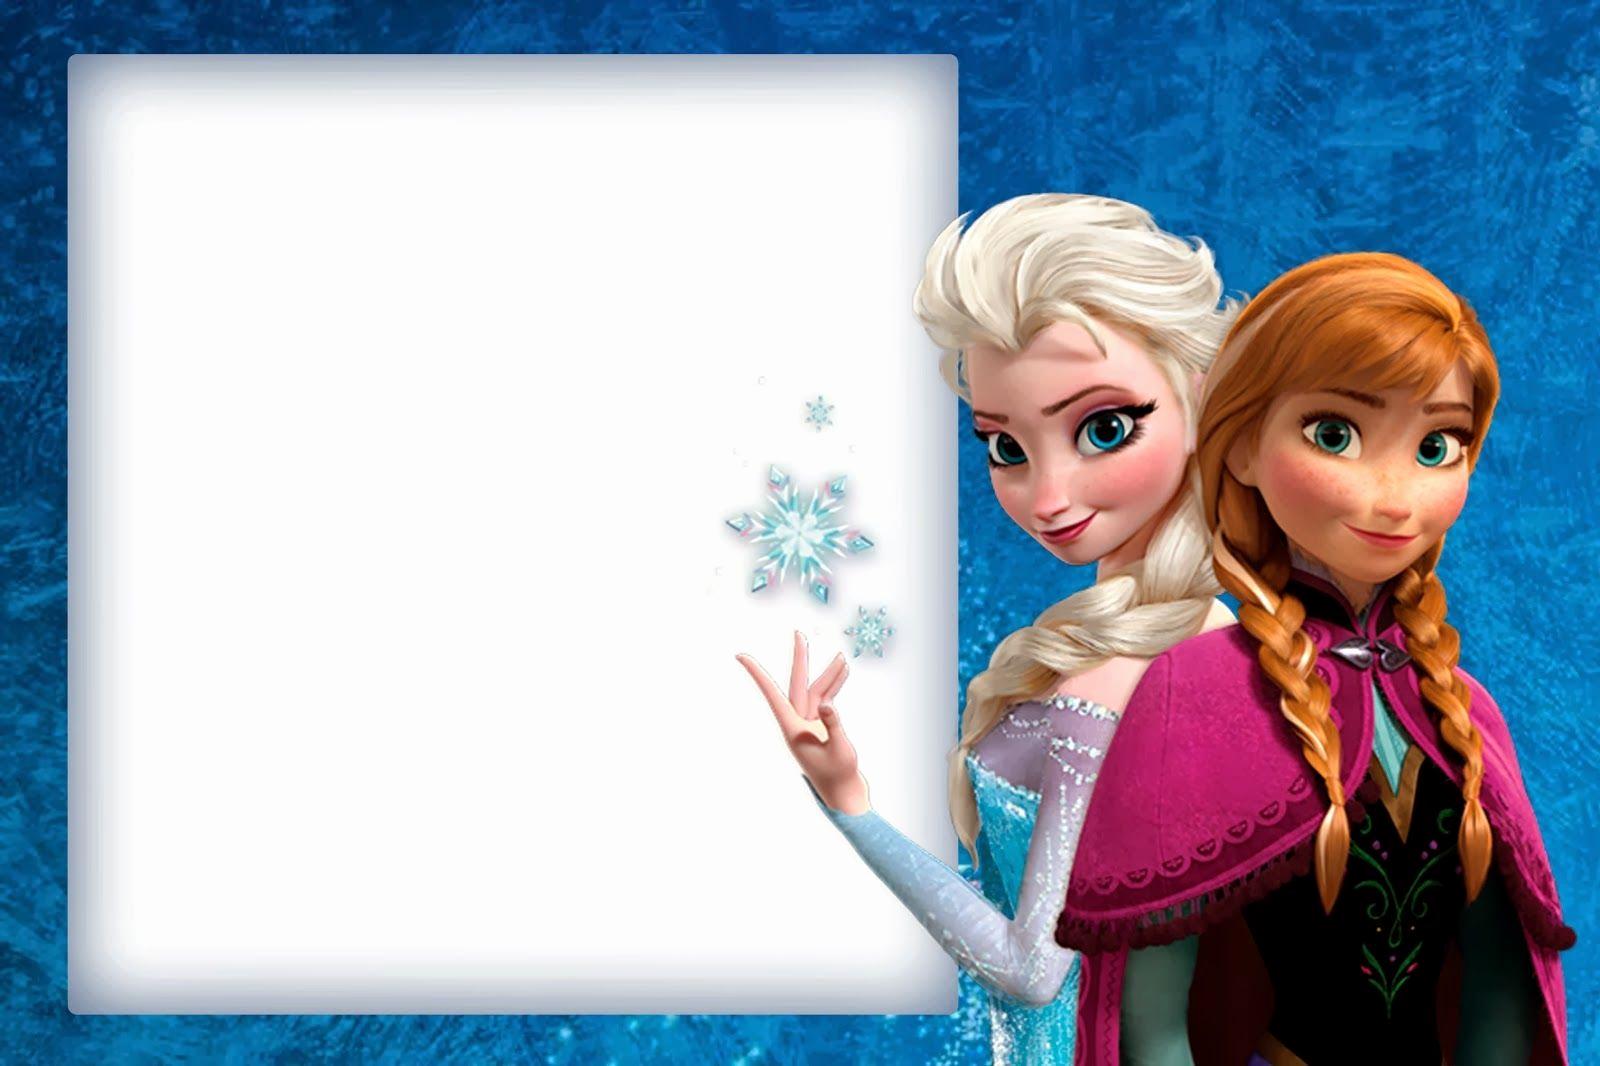 Free Printable Frozen Invitation Template Fresh Frozen Cute Free Printable Invitations A Few Nice Ones